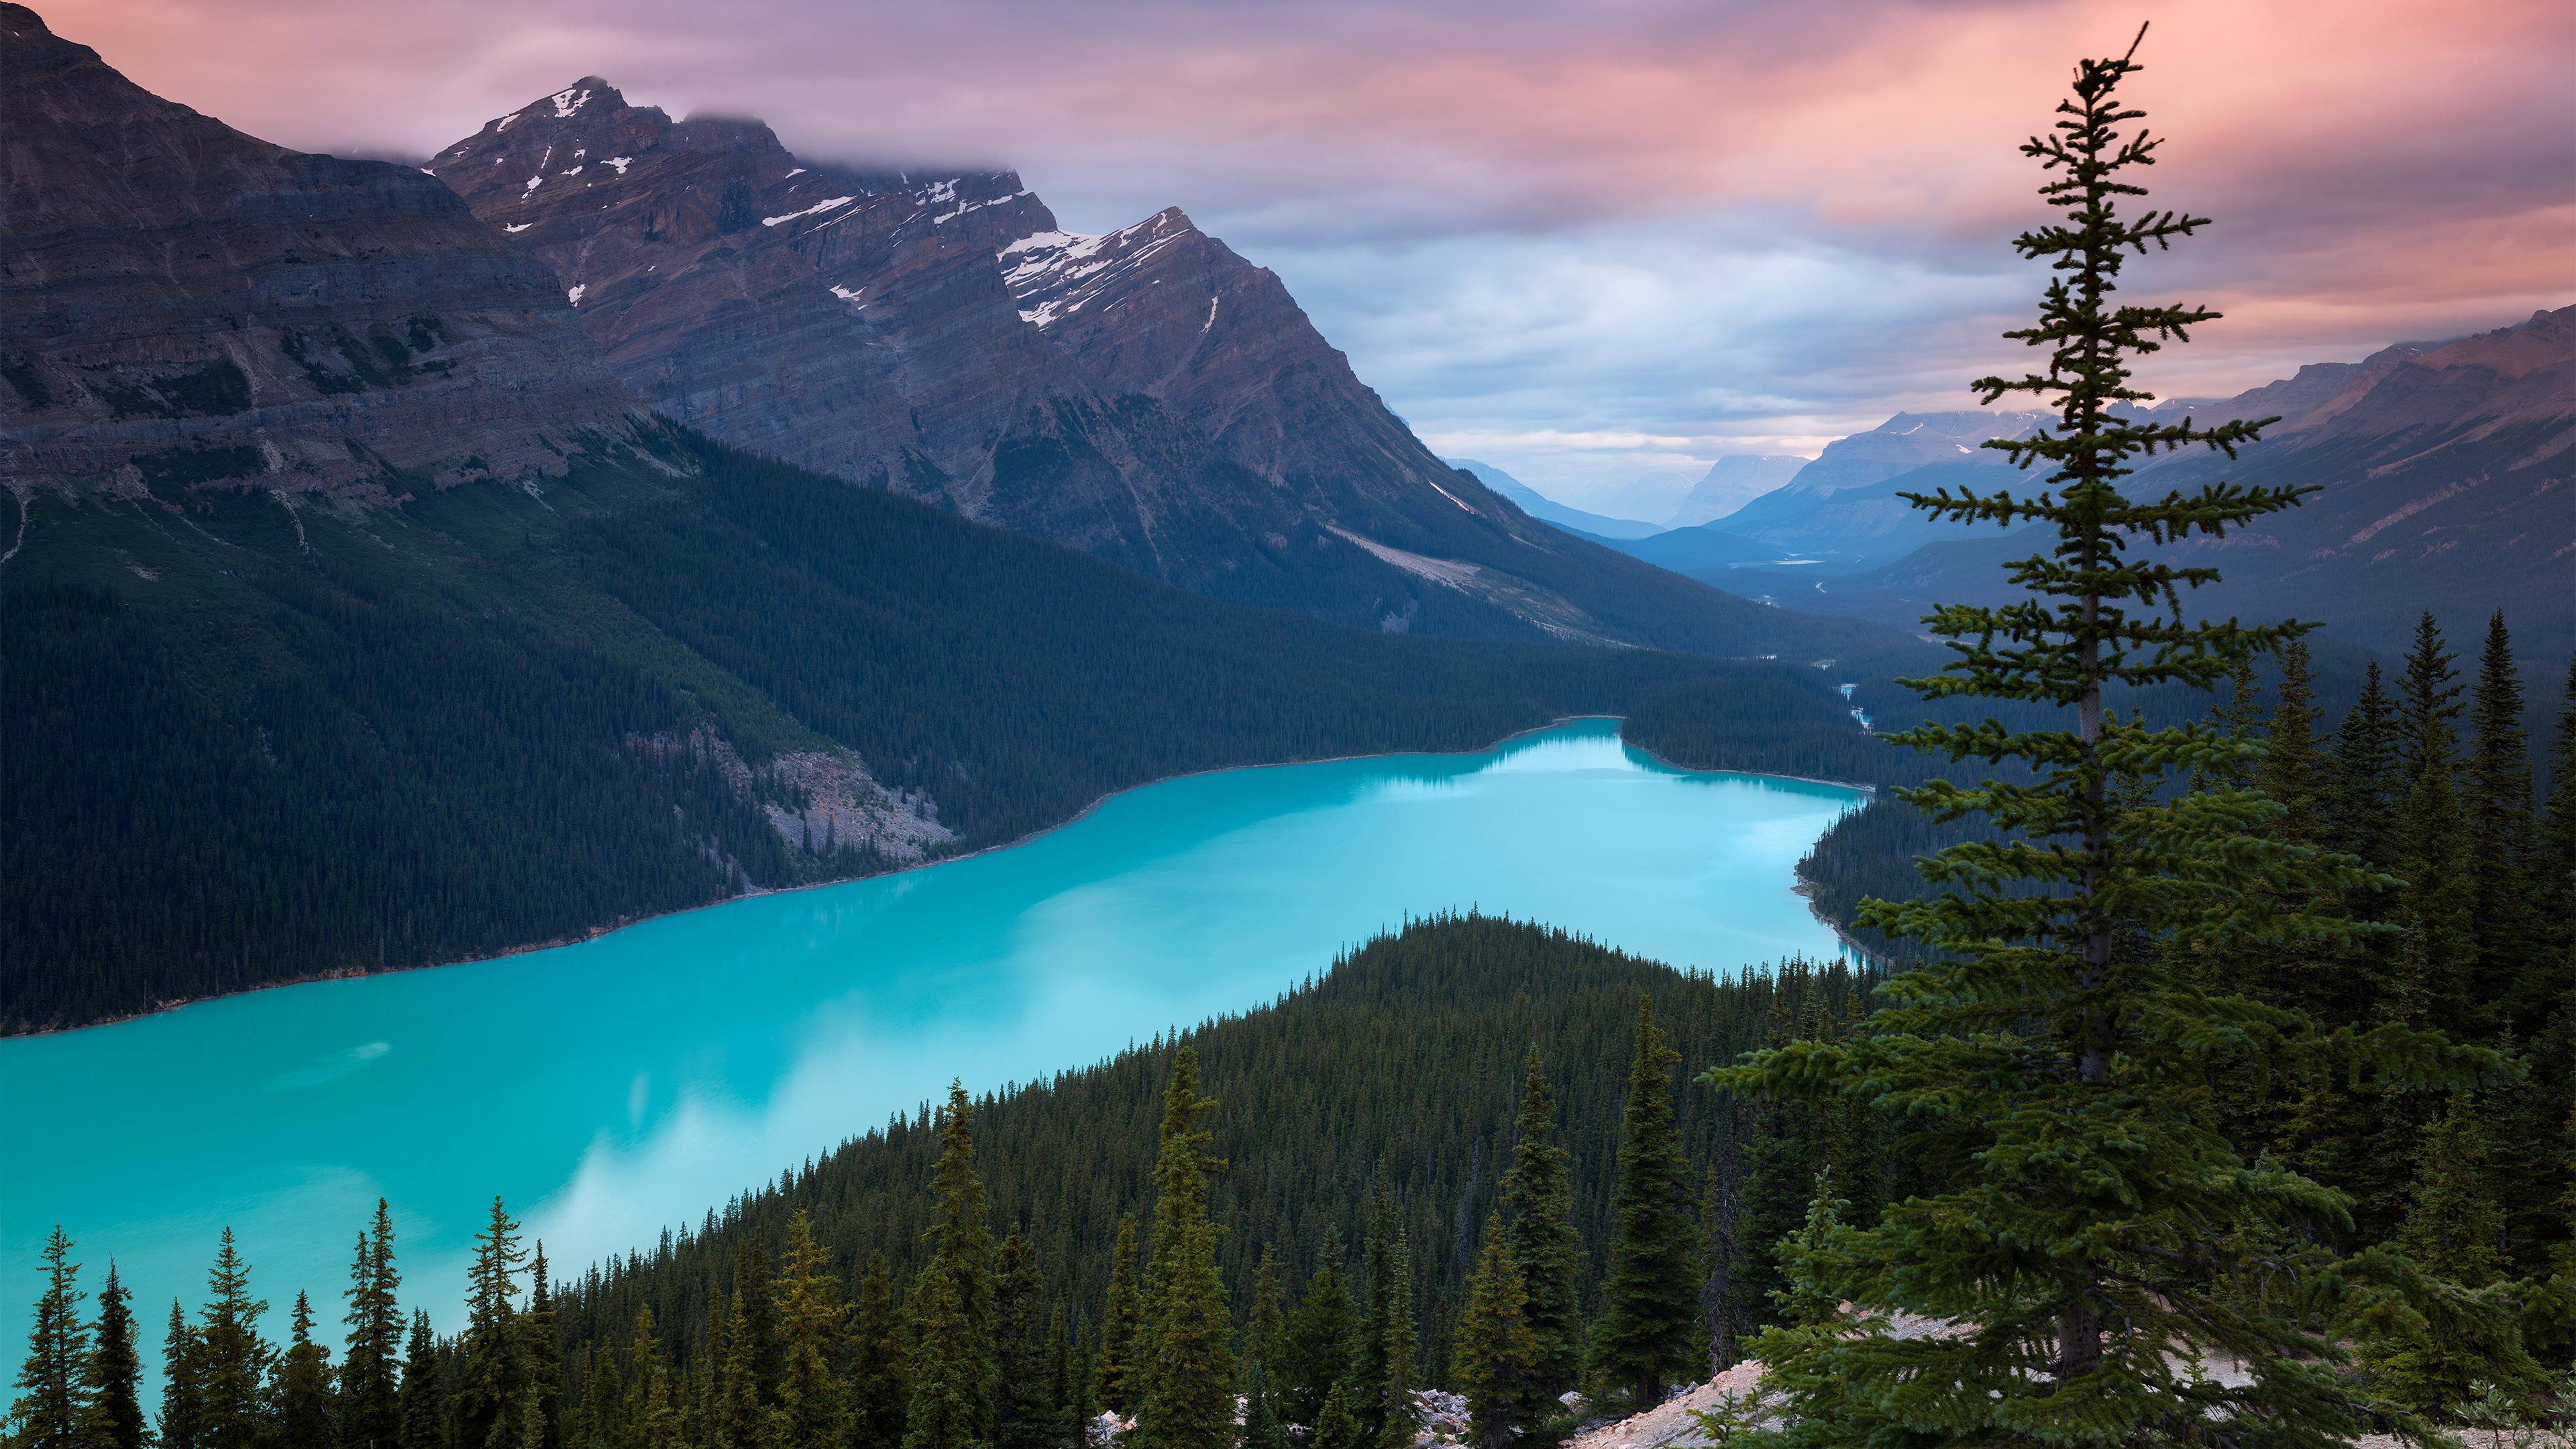 Peyto Lake Canada Mountains 4k Hd Nature 4k Wallpapers